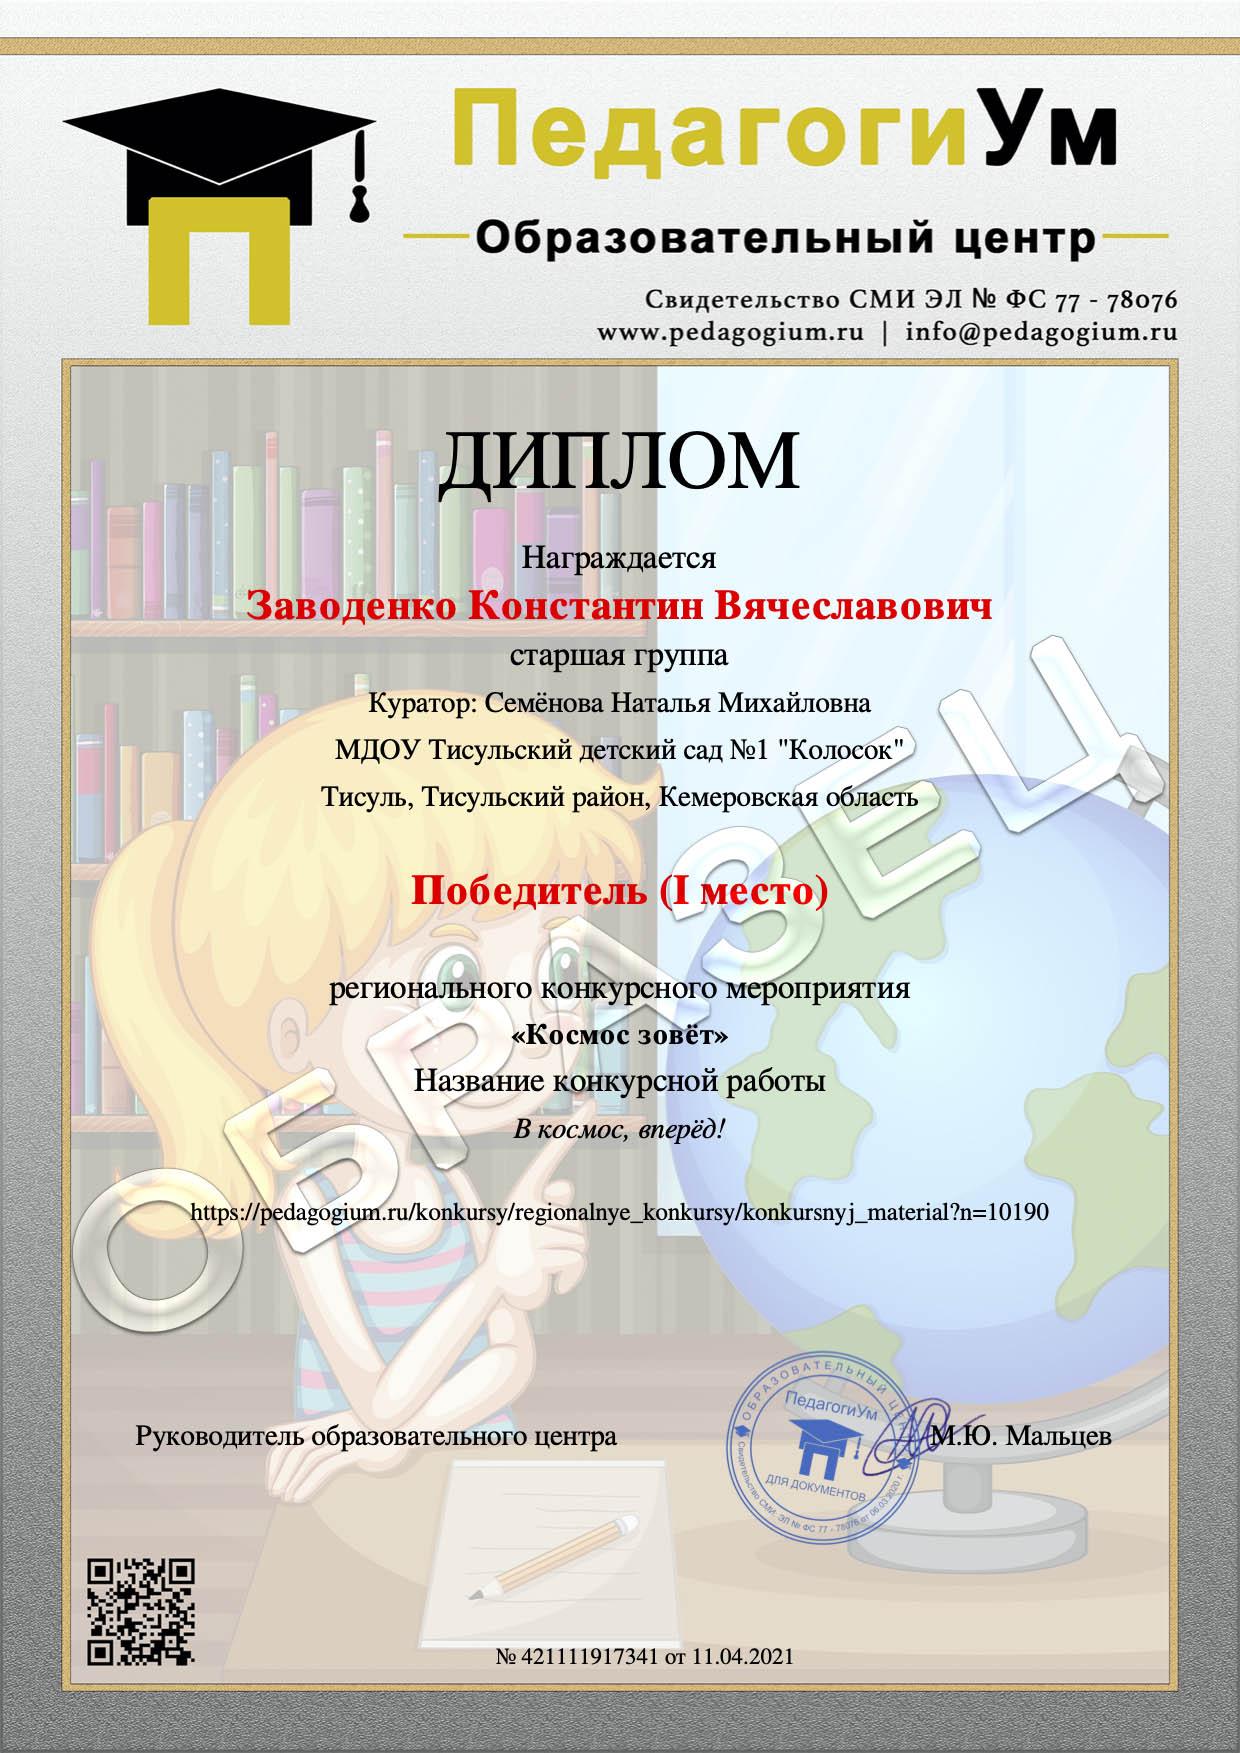 Образец документа воспитаннику-участнику регионального конкурса центра ПедагогиУм.